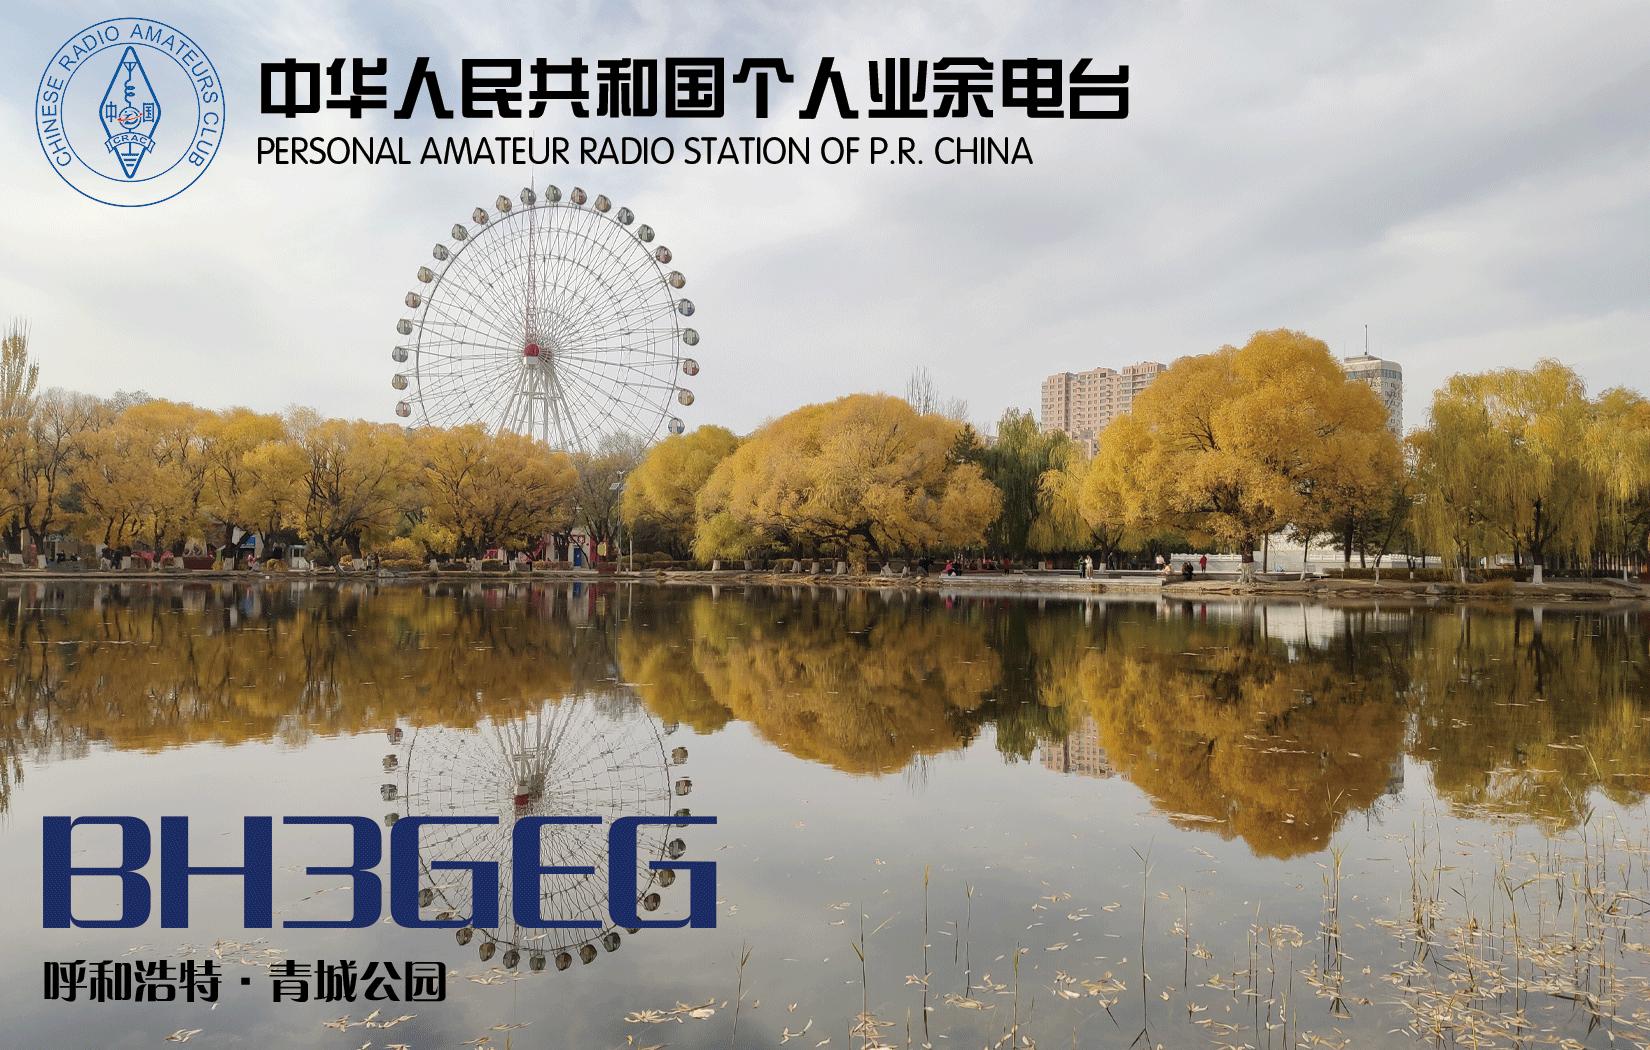 BH3GEG的电台日志 ︱ BH3GEG の Logbook